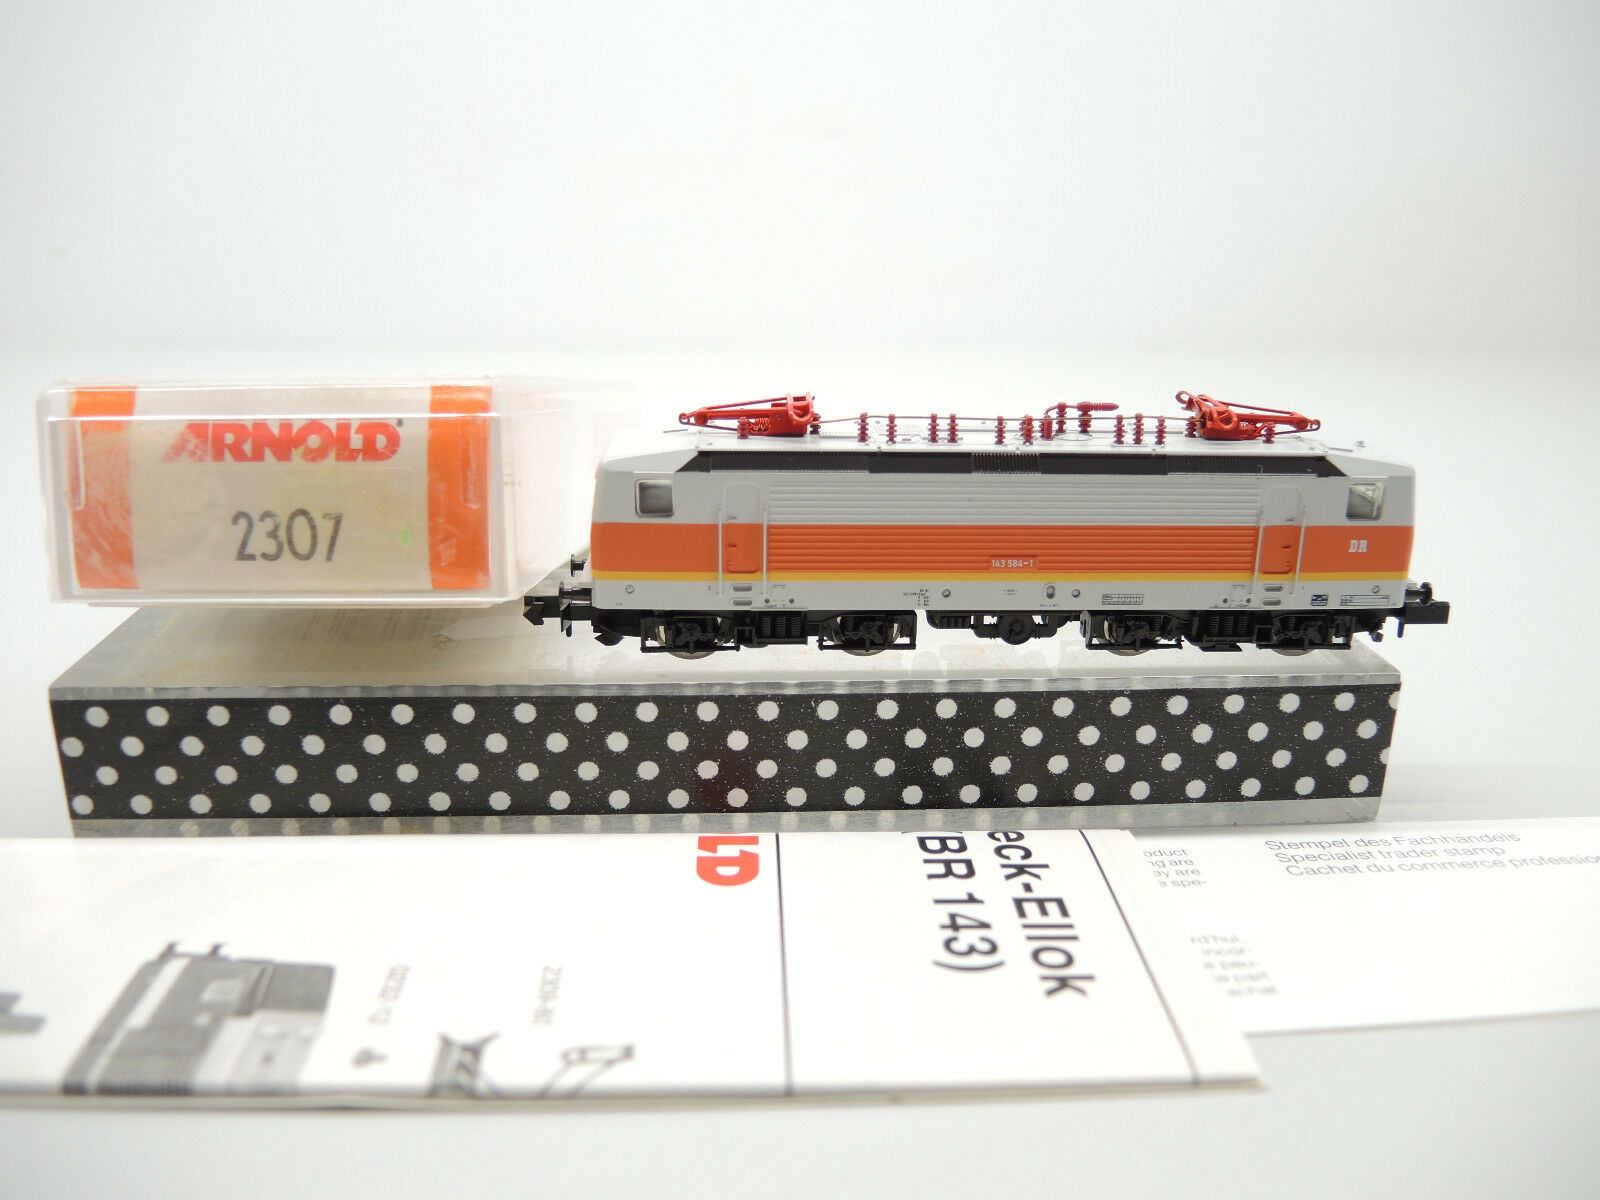 Arnold 2307 E-Lok BR 143 584-1 der DR, sehr gut, Anleitung, OVP